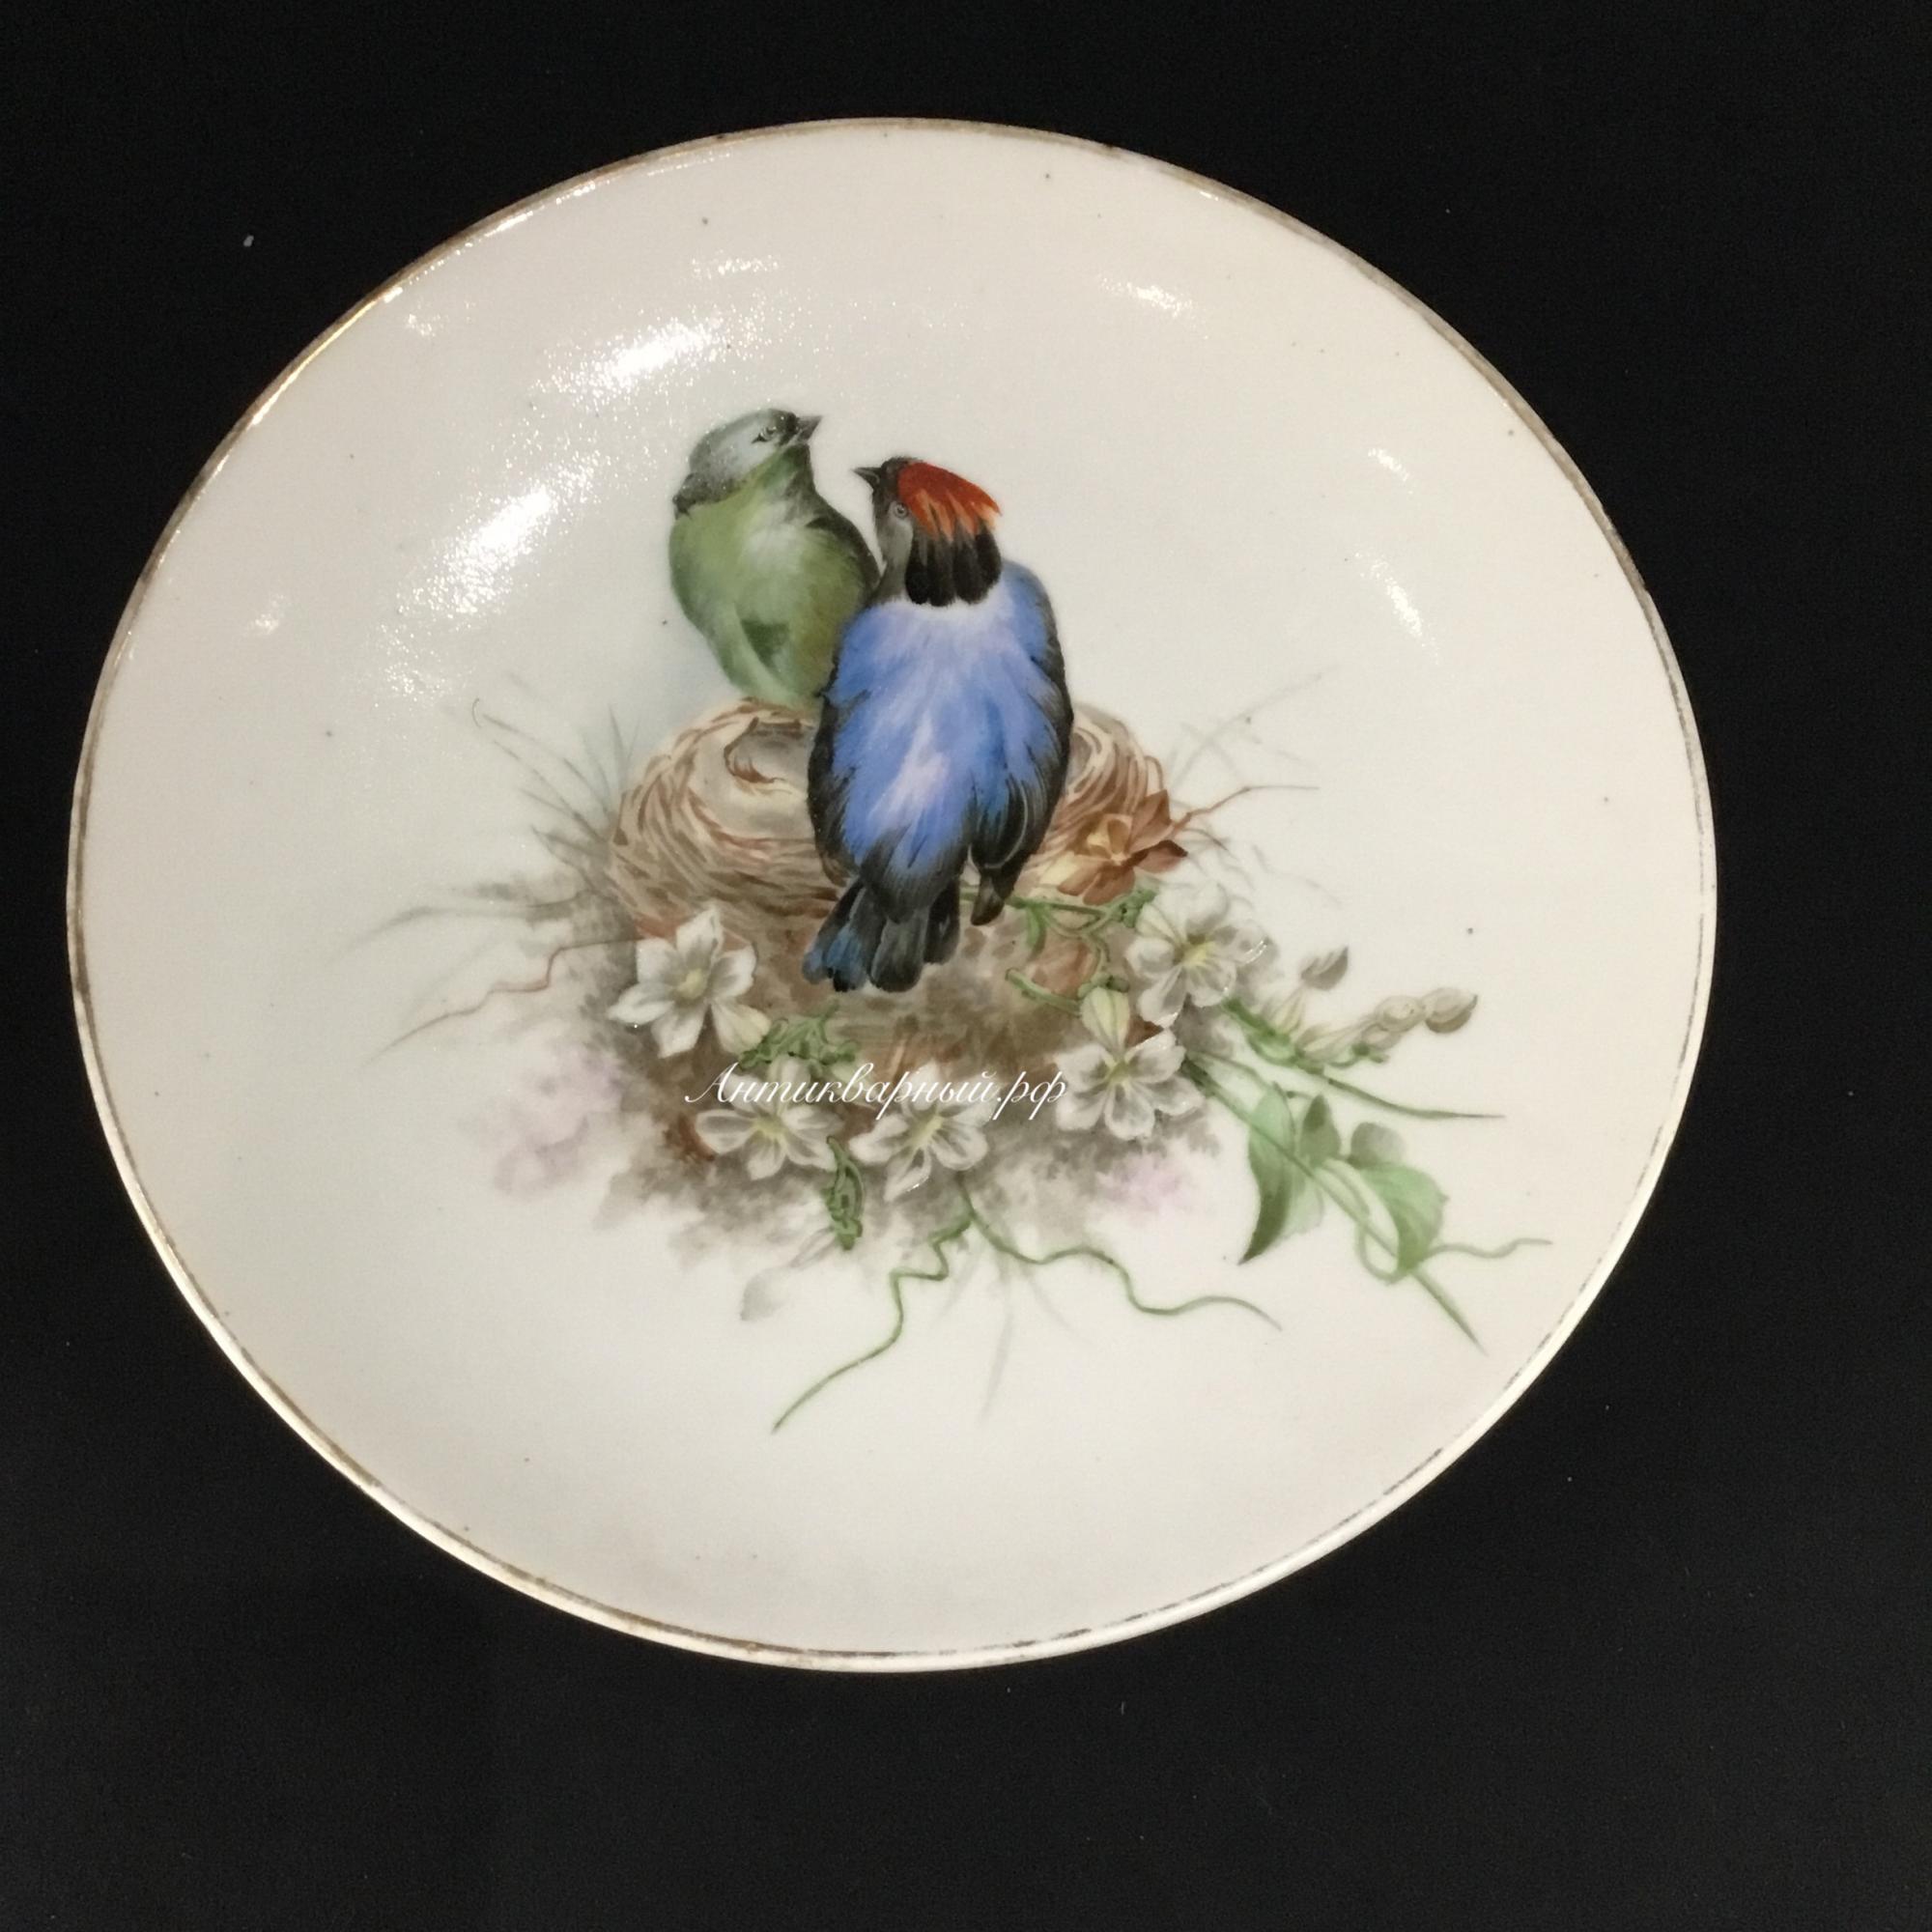 Декоративная настенная тарелка с птицами